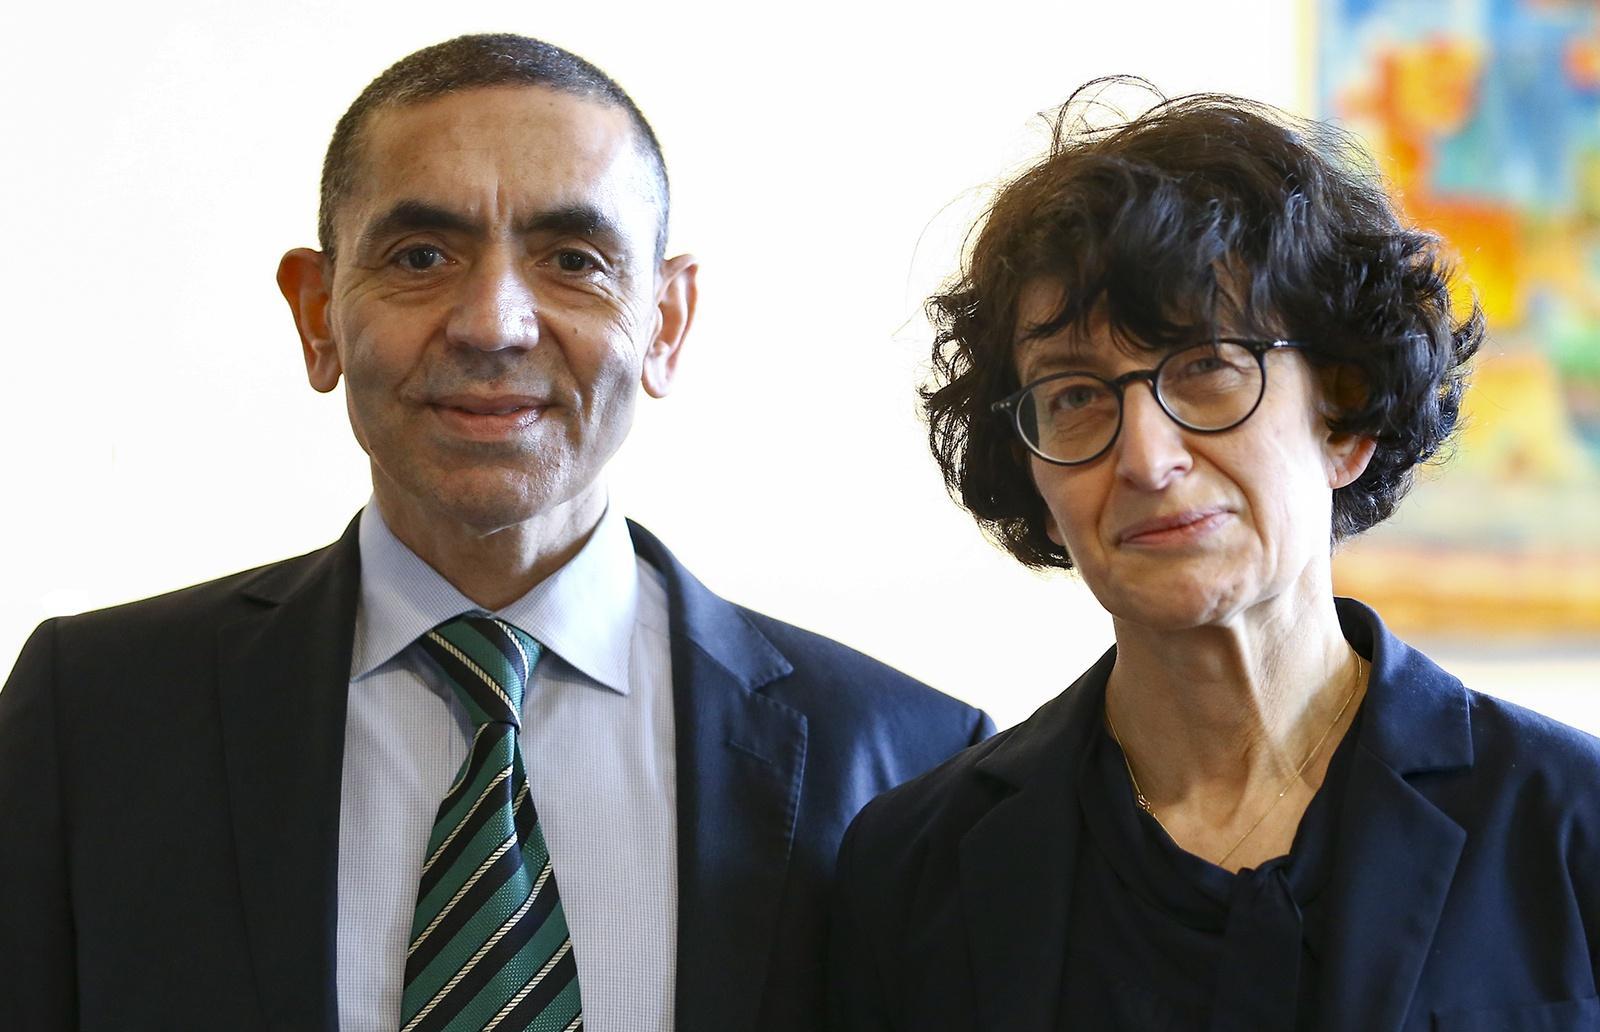 Uğur Şahin and Özlem Türeci cofounded BioNTech in 2008.